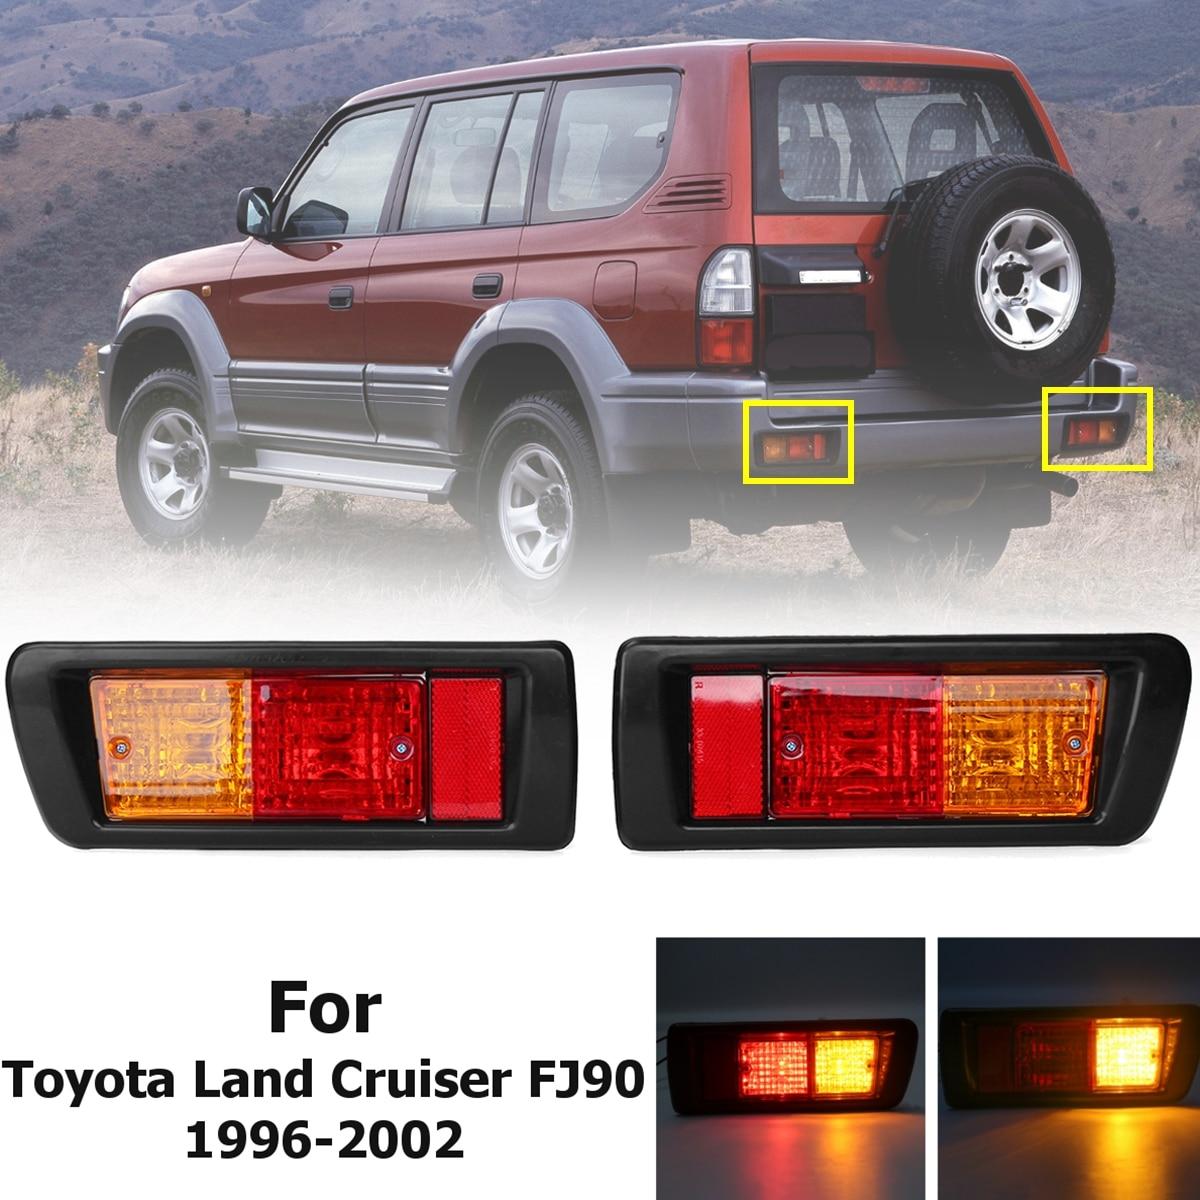 2x Rear Bumper Reflector Light Lamp Warning Brake Taillight for Toyota Land Cruiser Lc90 FJ90 1996 1997 1998 1999 2000 2001 2002